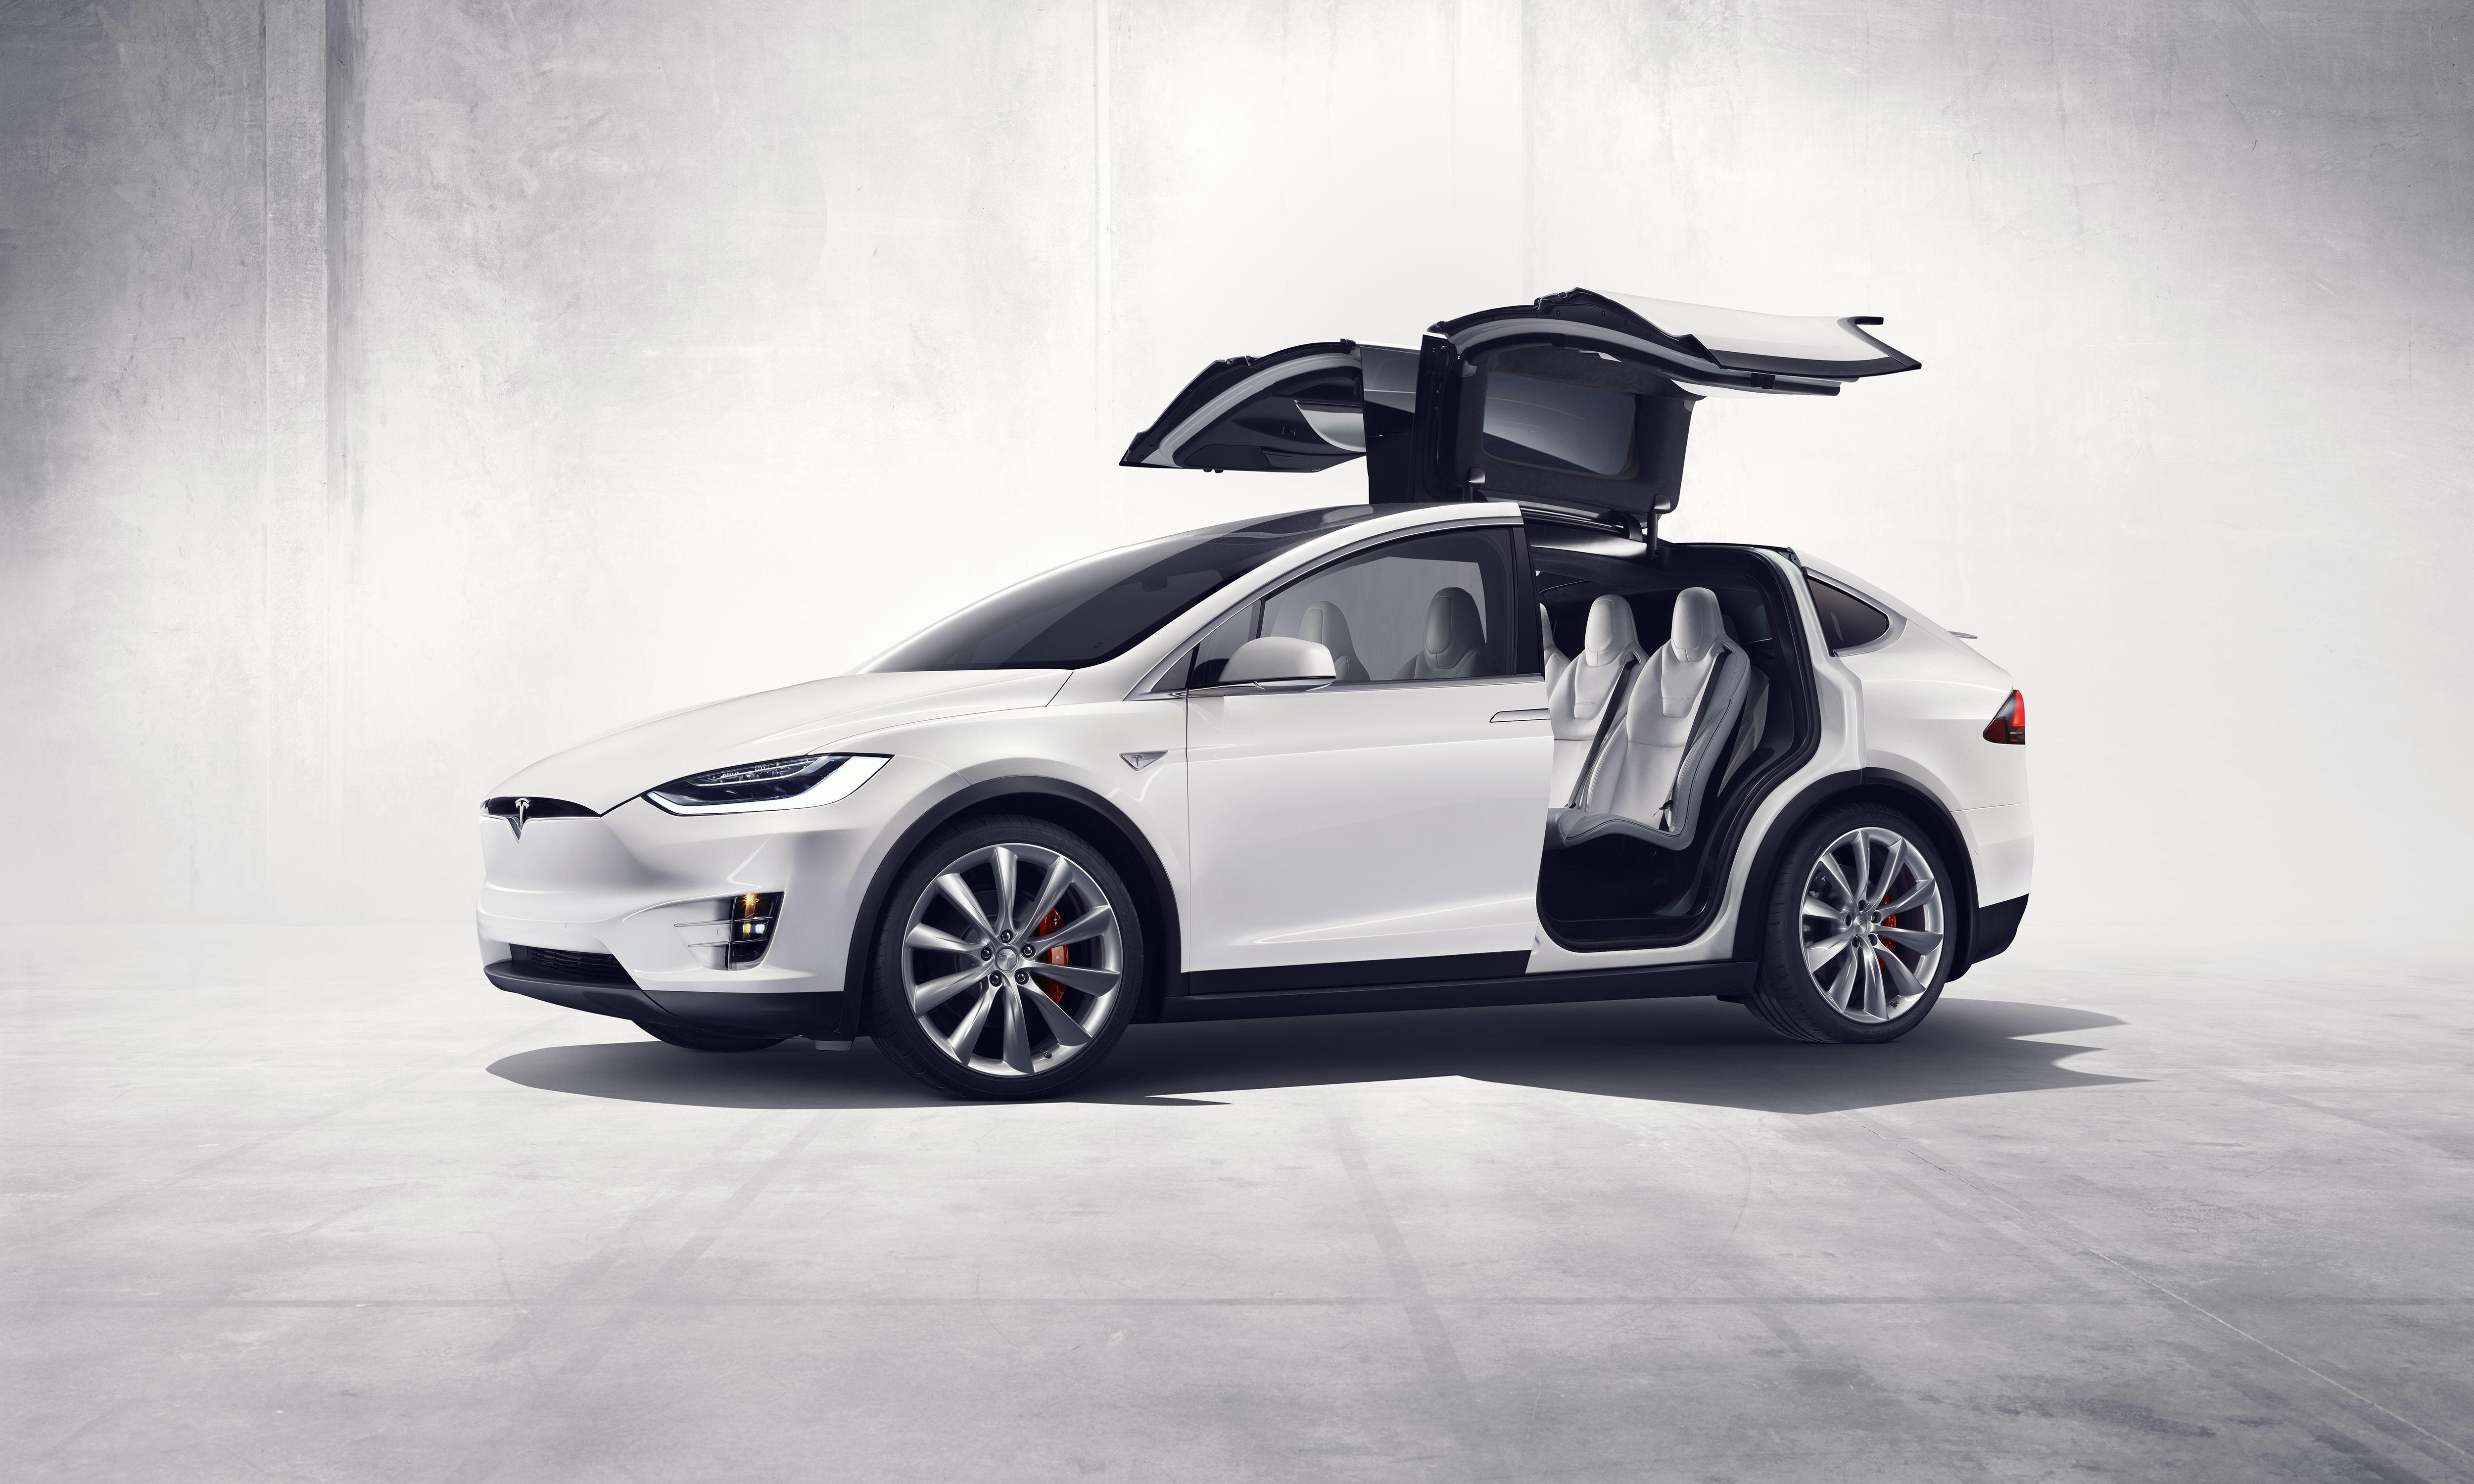 Breaking News X 2 Tesla Model Production Kicks Into High Gear Cleantechnica Exclusive